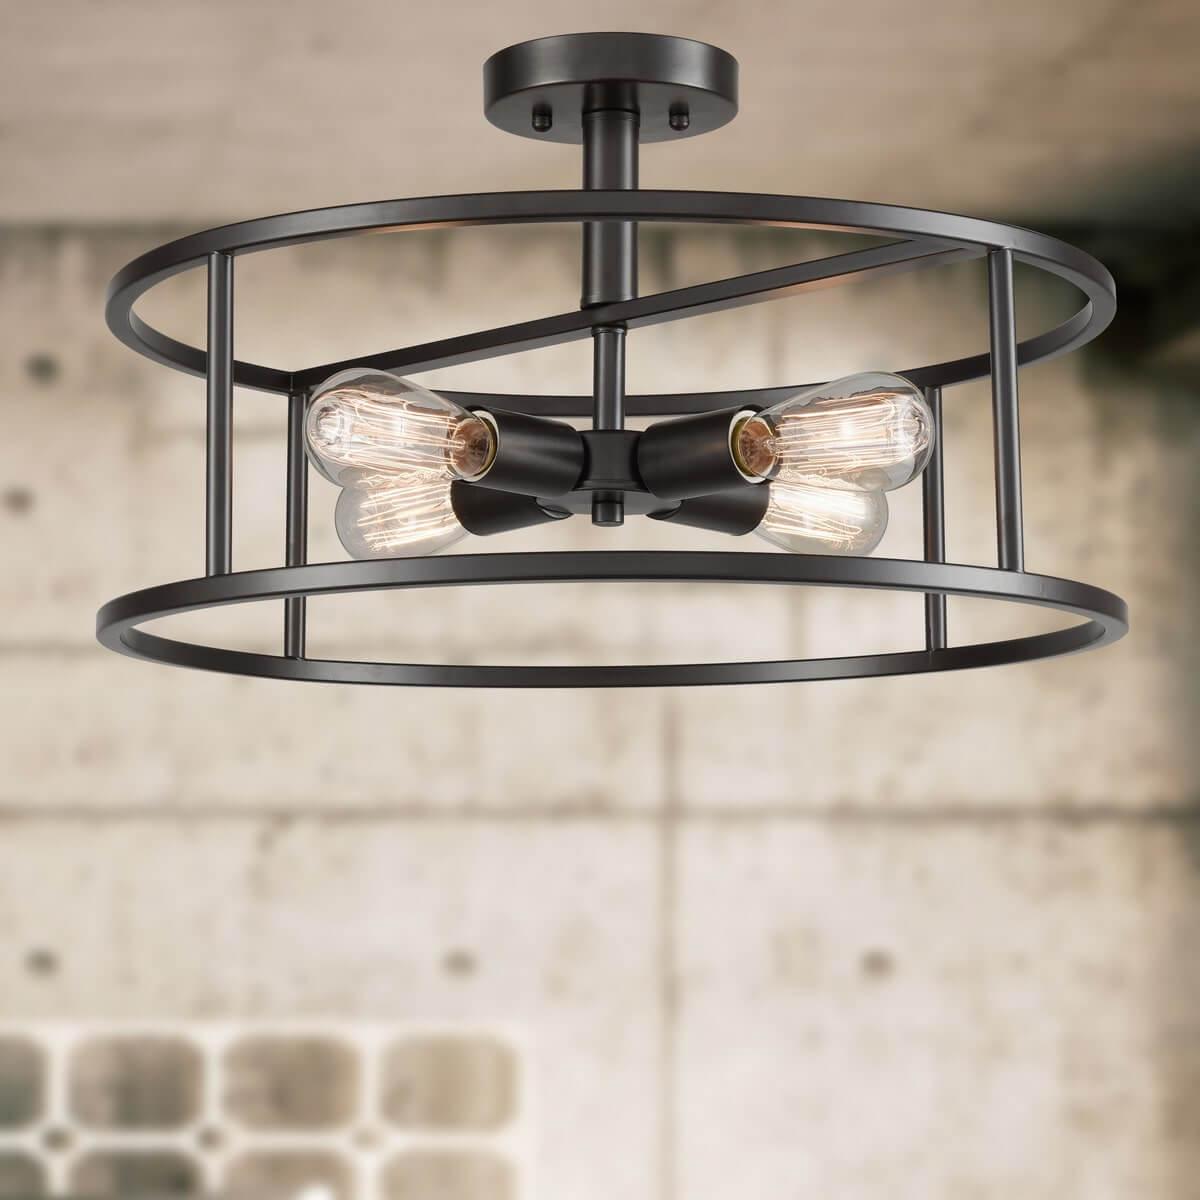 4-Light Industrial Metal Cage Drum Semi Flush Kitchen Ceiling Lights